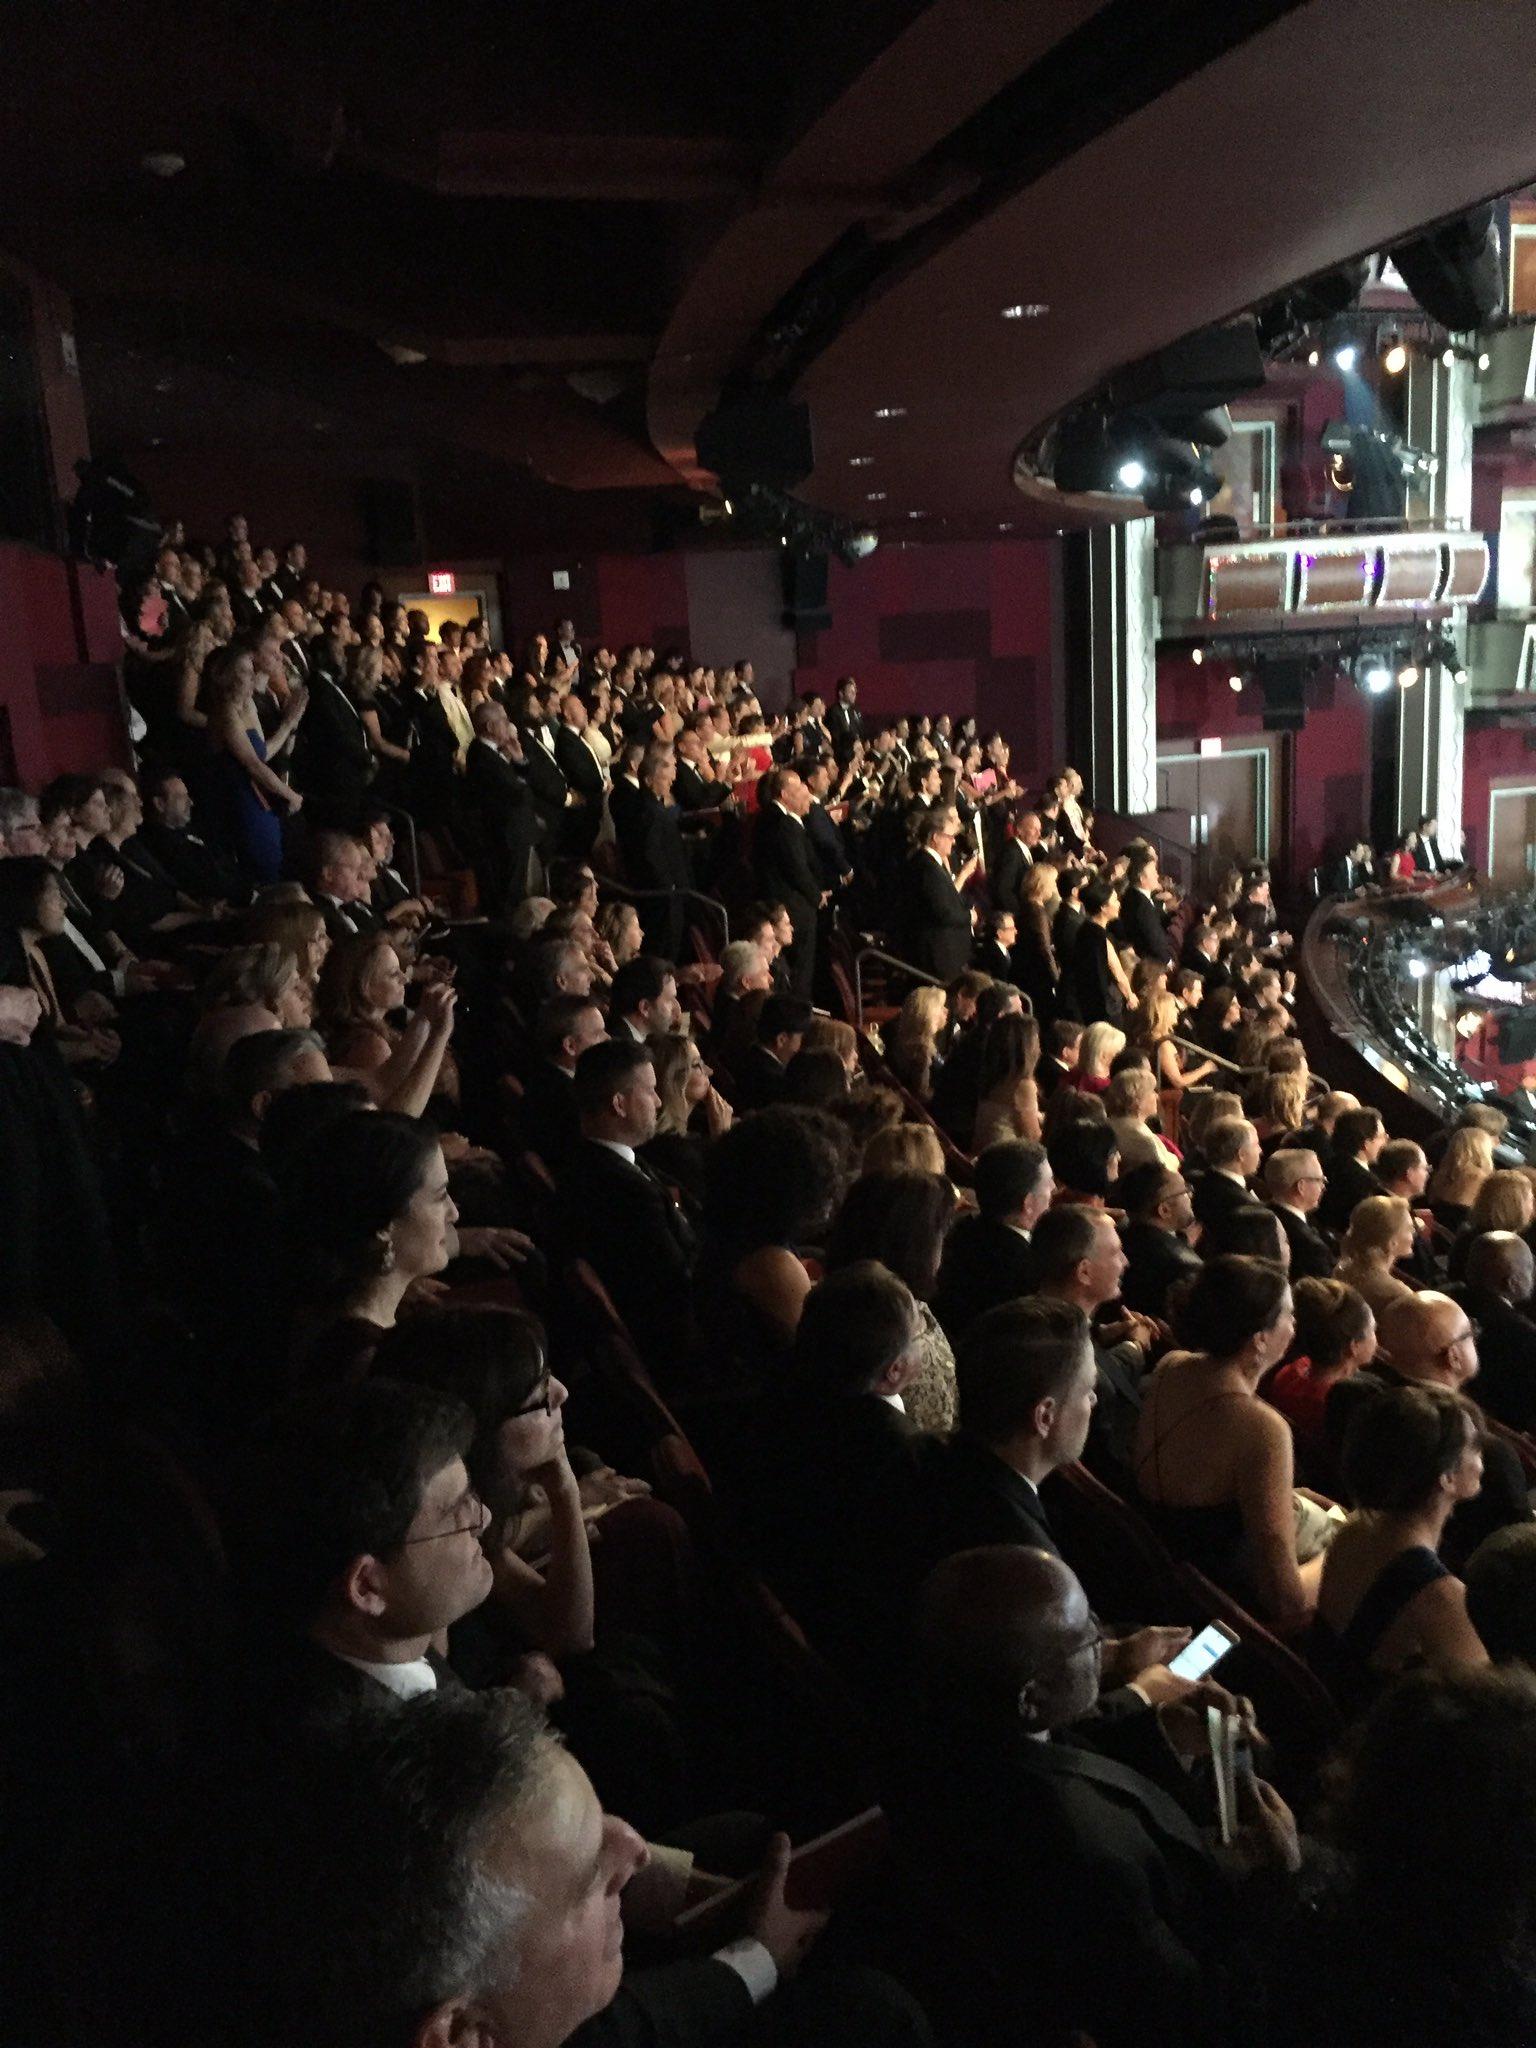 RT @chrissgardner: Half crowd in Mezz 1 is standing. Clapping along to @jtimberlake . #Oscars https://t.co/RrDIHjxxZg